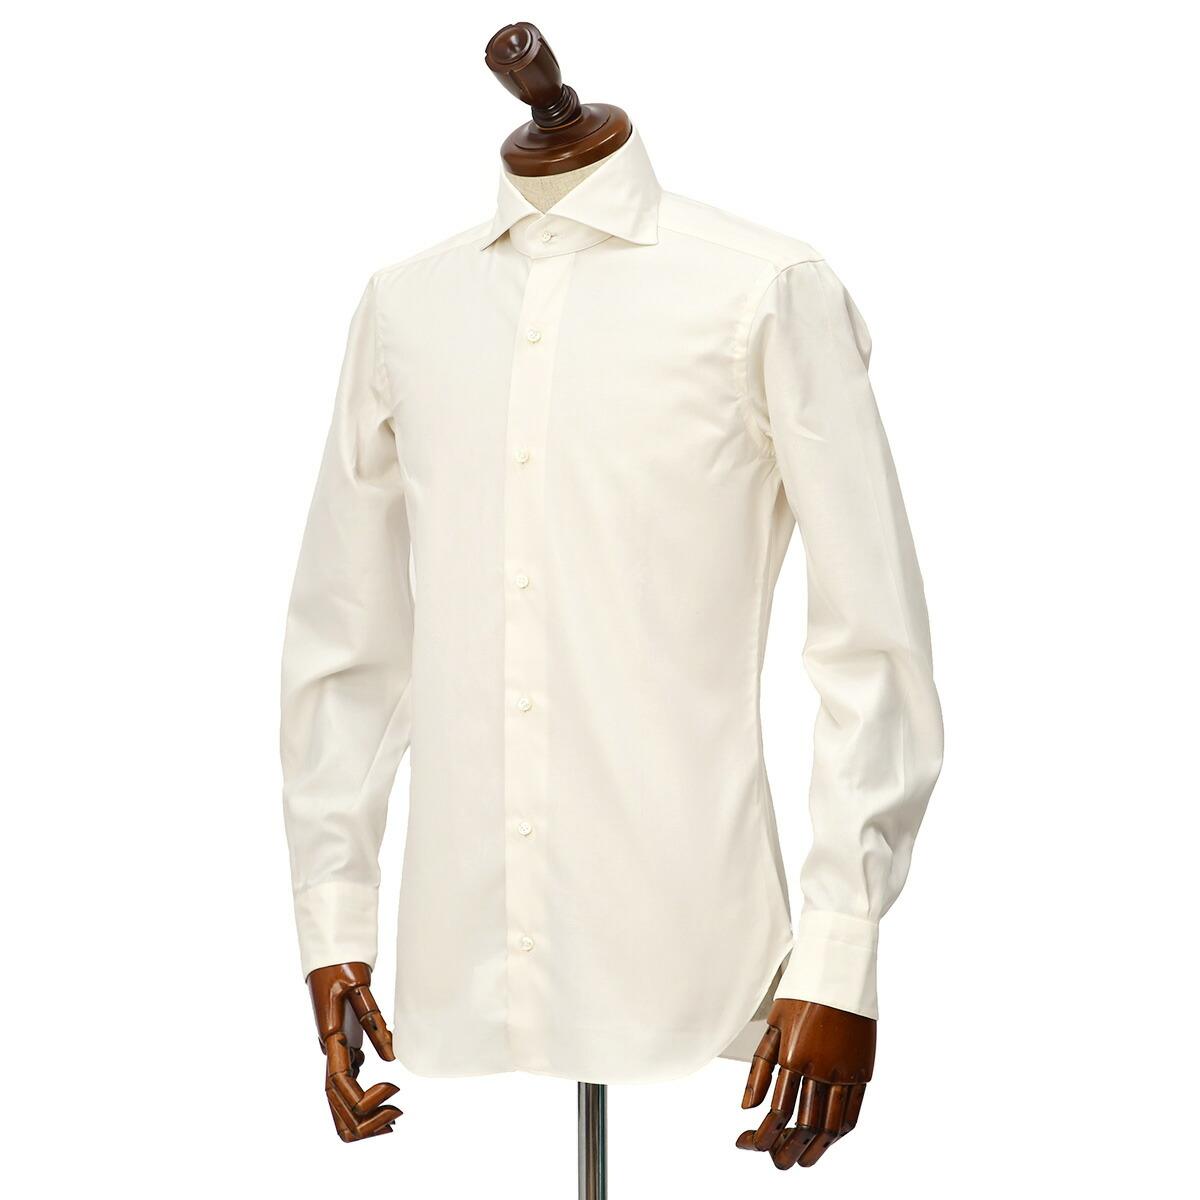 BARBA【バルバ】ドレスシャツ BRUNO I1U262U07413 フラシ コットン オックスフォード オフホワイト